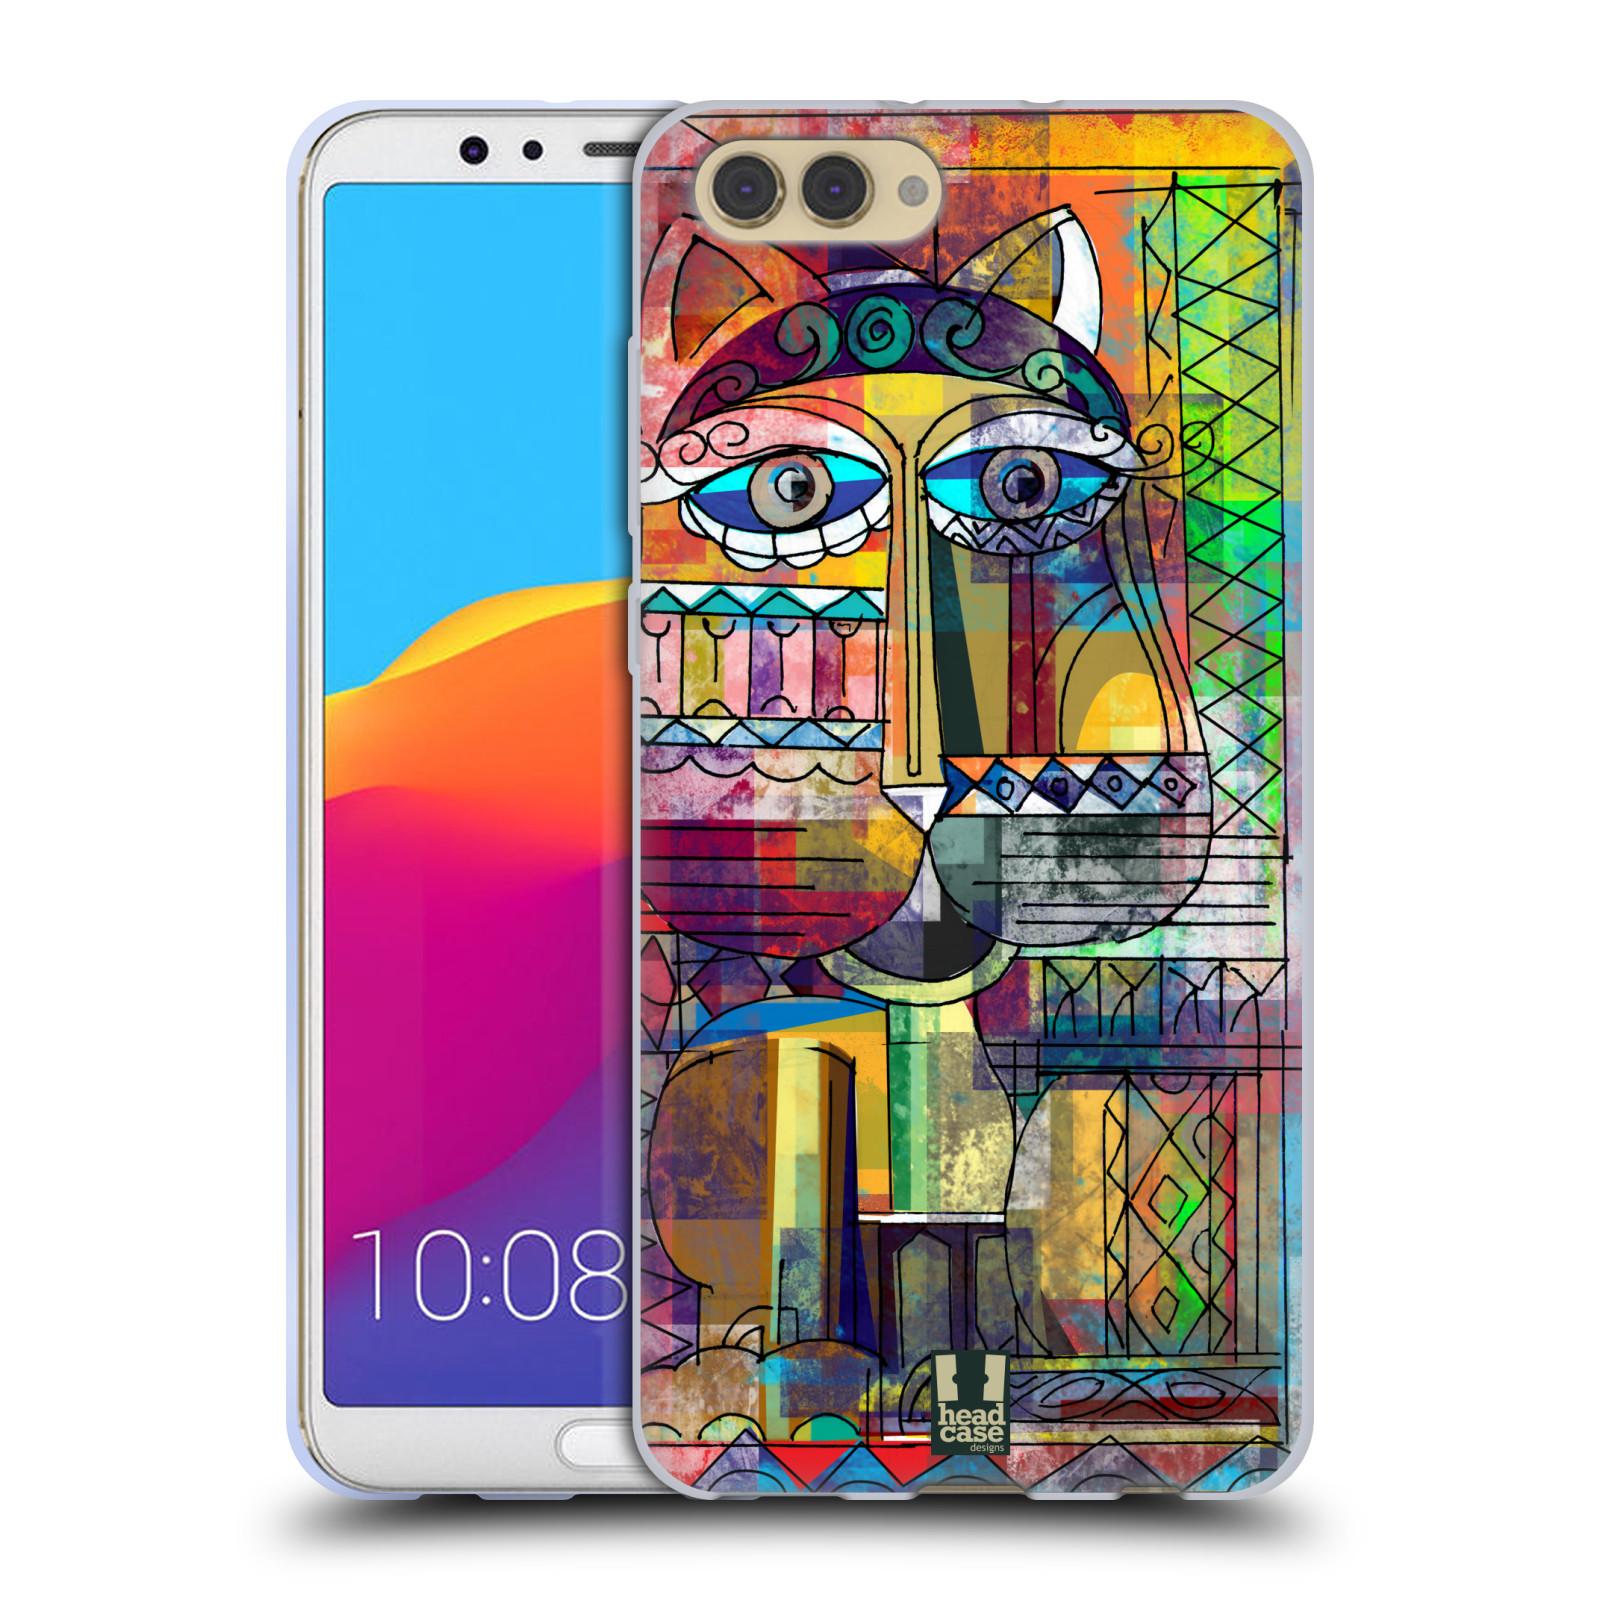 Silikonové pouzdro na mobil Honor View 10 - Head Case - AZTEC KORAT